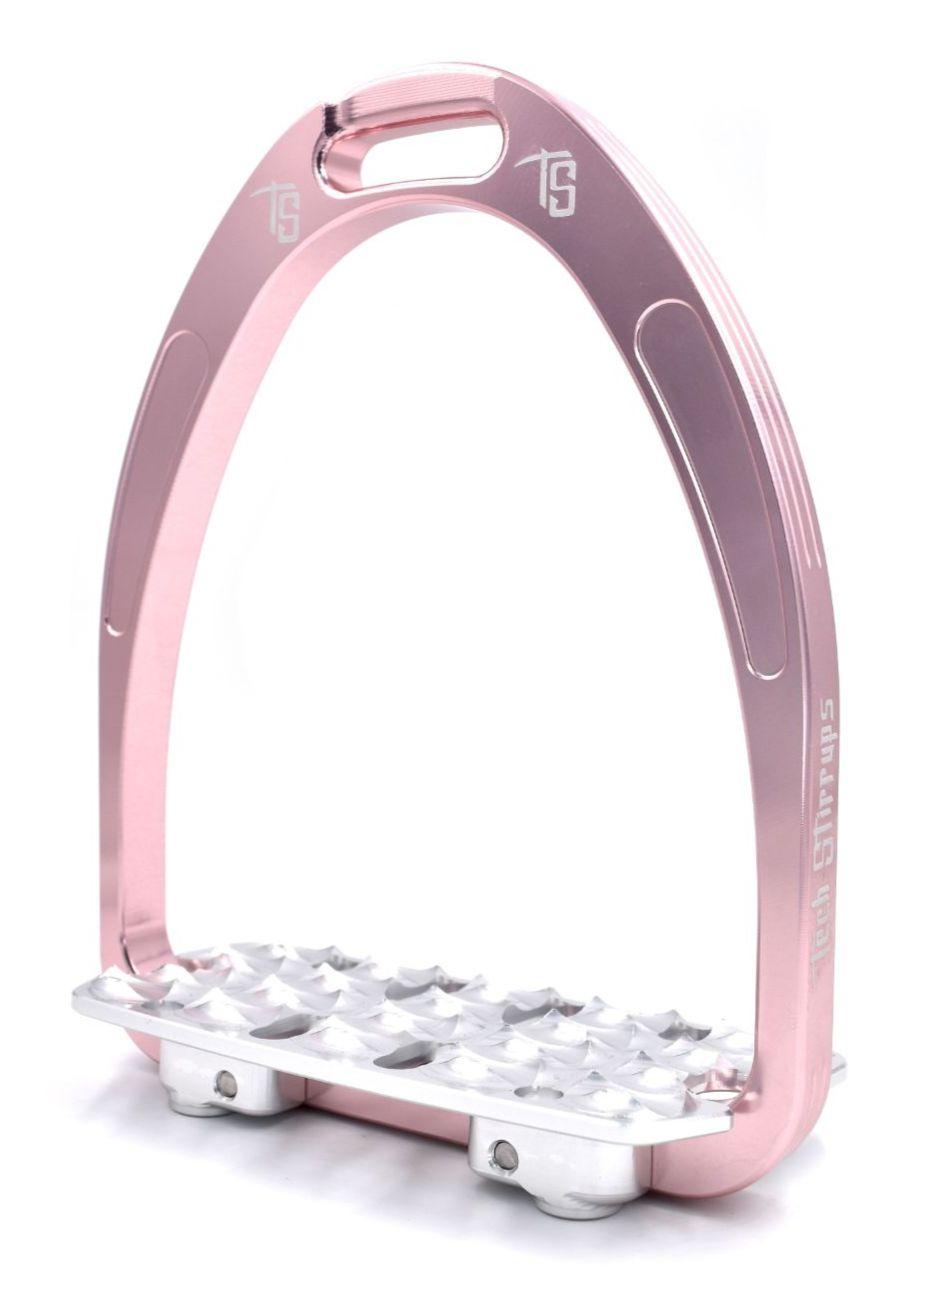 Tech Classic Endurance Stirrups - Pink (£116.67 Exc VAT & £140.00 Inc VAT)